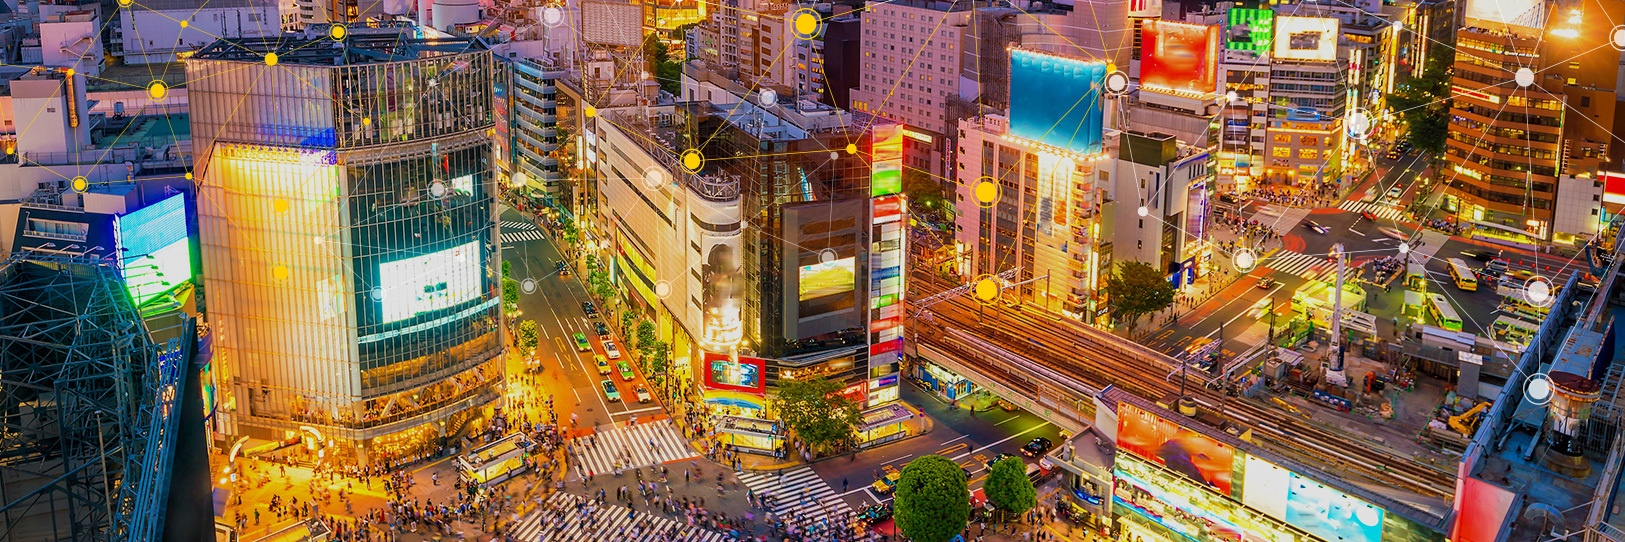 Global Data Protection Laws: Japan